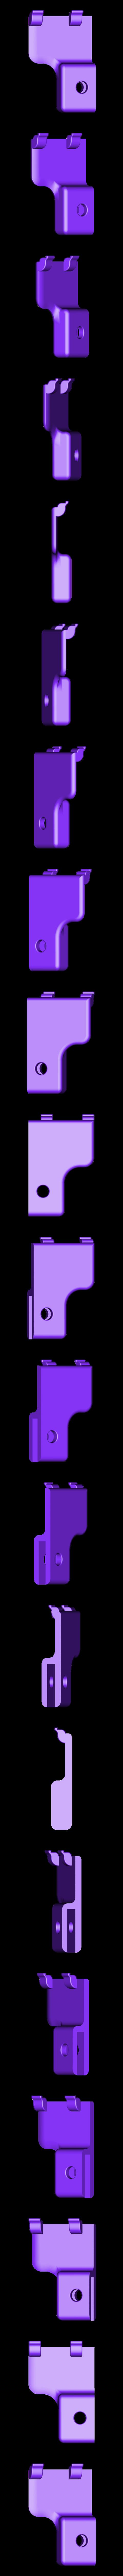 Pièce3Symétrie.STL Download free STL file Shower shampoo holder • 3D printable template, CedricRoy